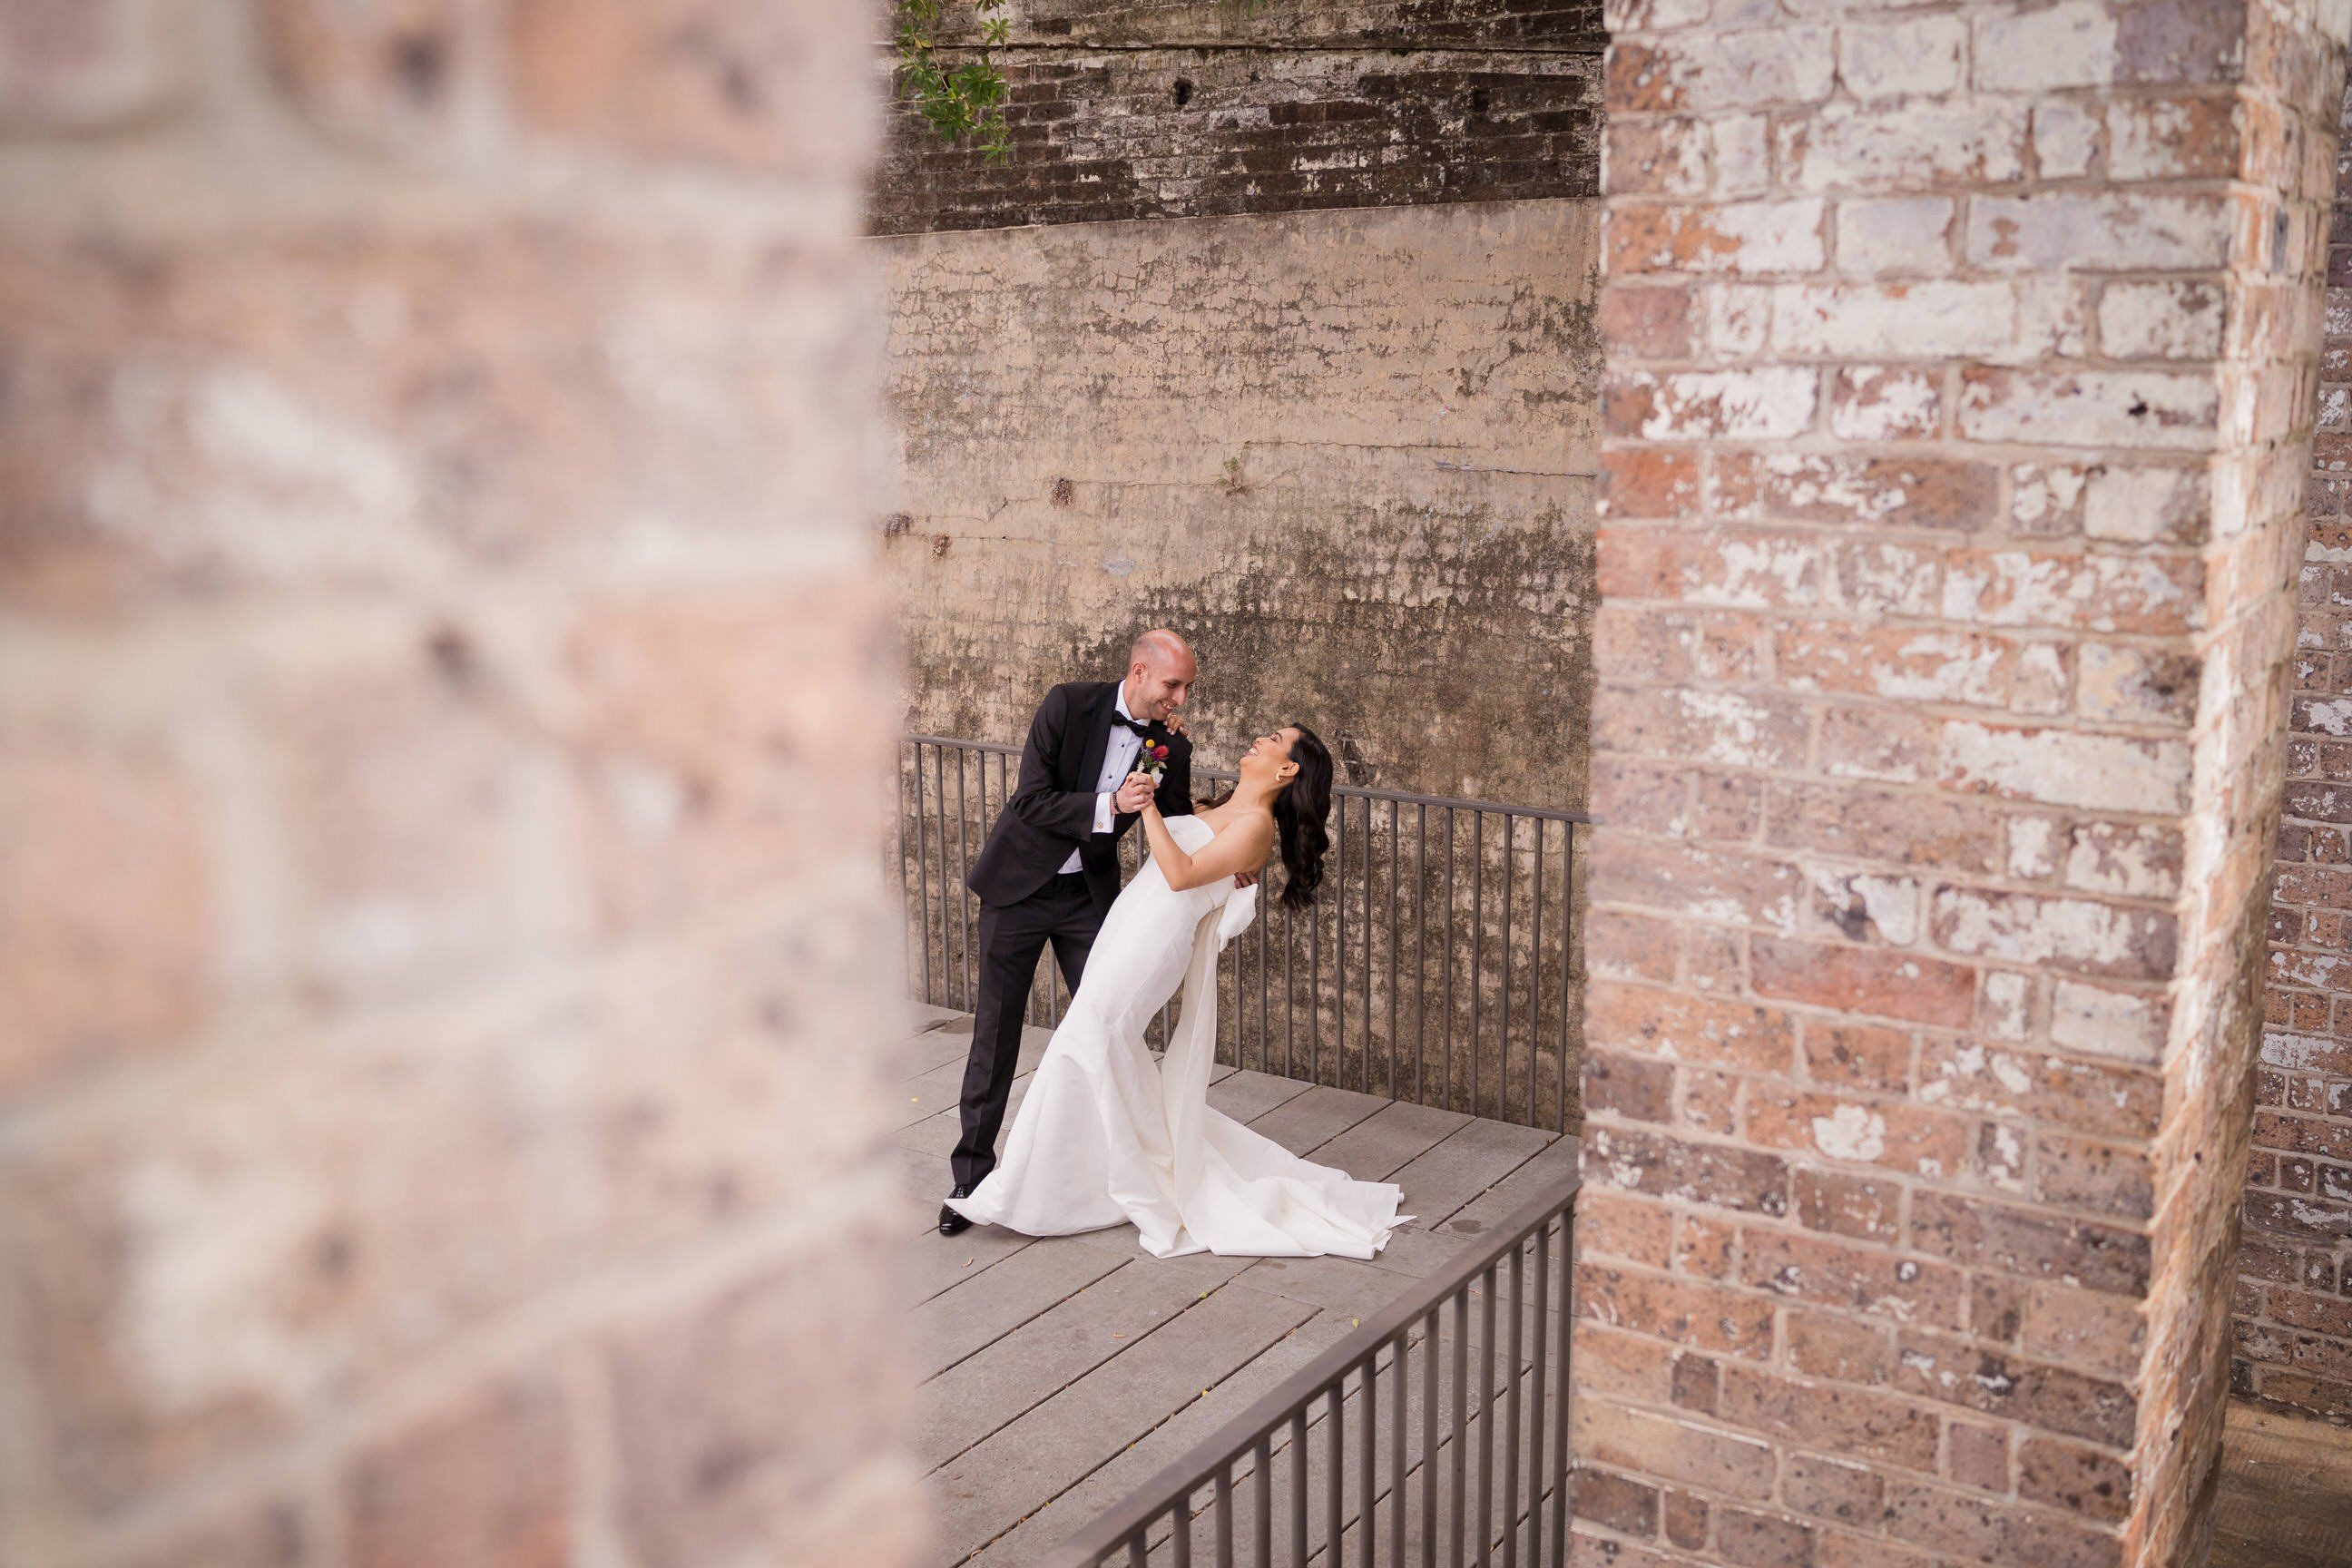 wedding photography, wedding photographer, destination wedding, wedding songs,